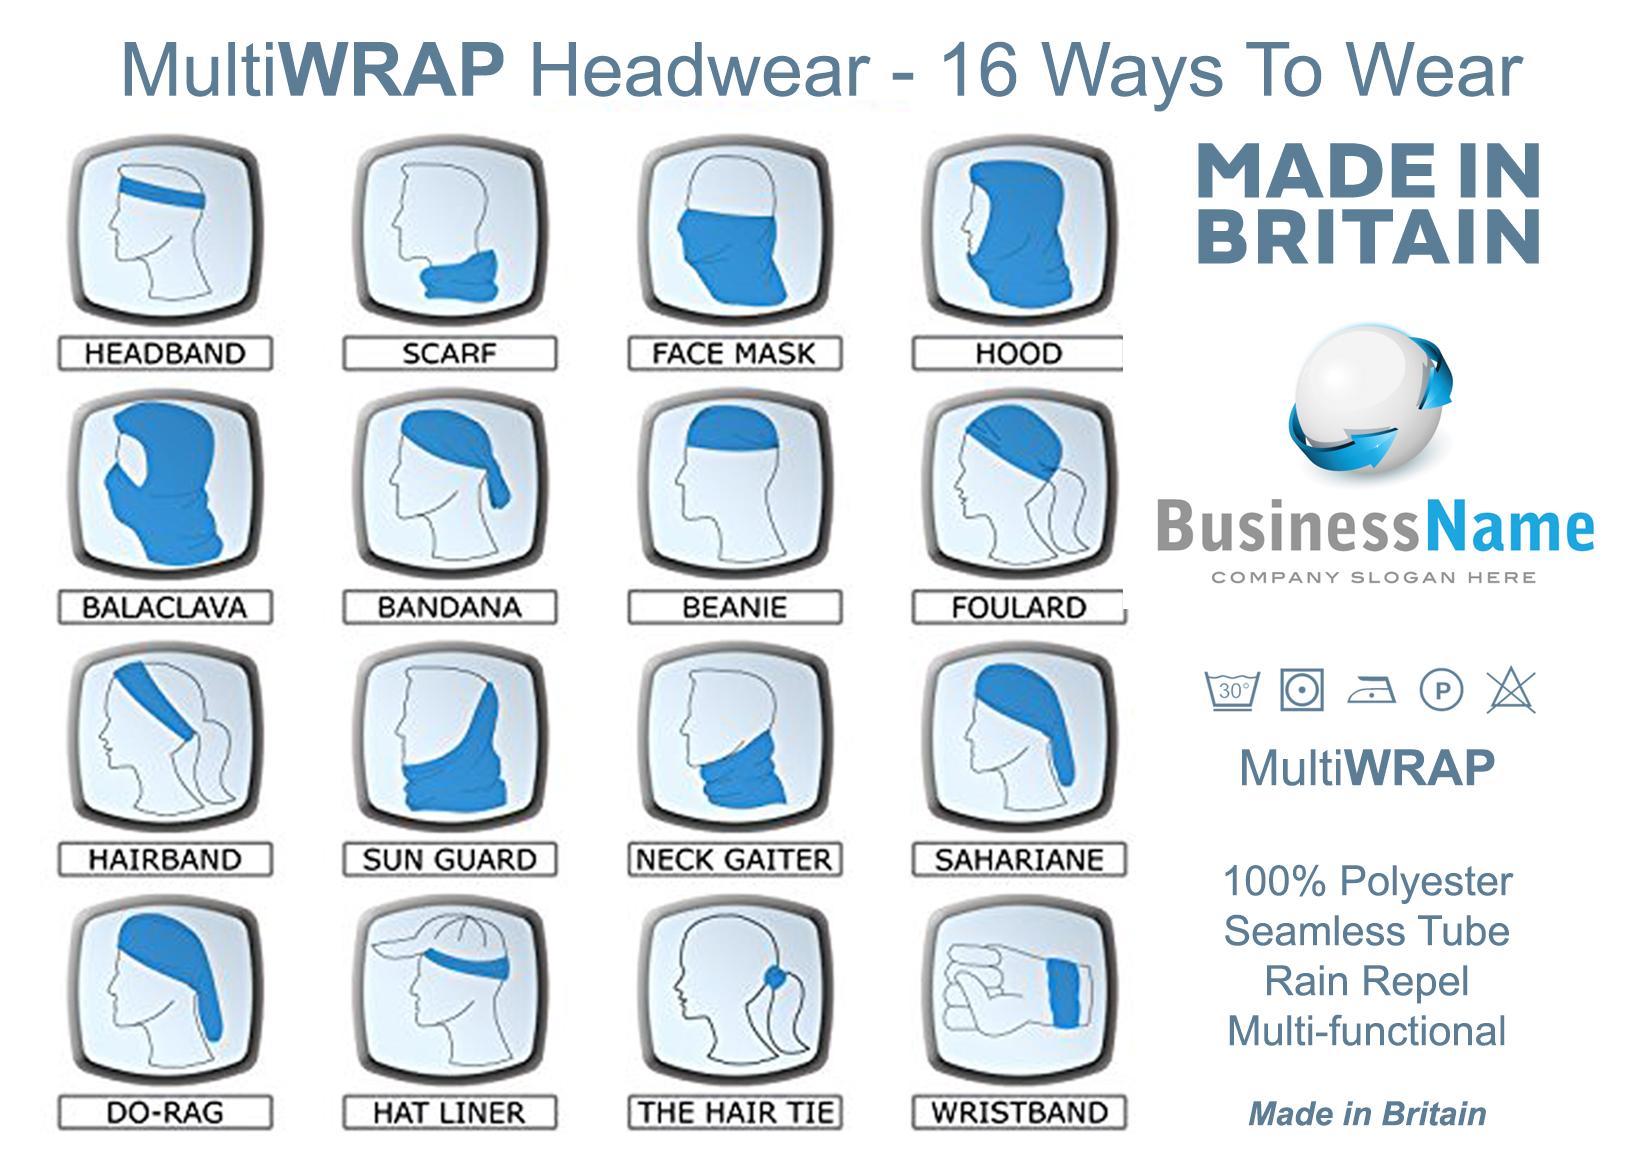 mutiwrap-oem-multifunctional-headwear.jpg